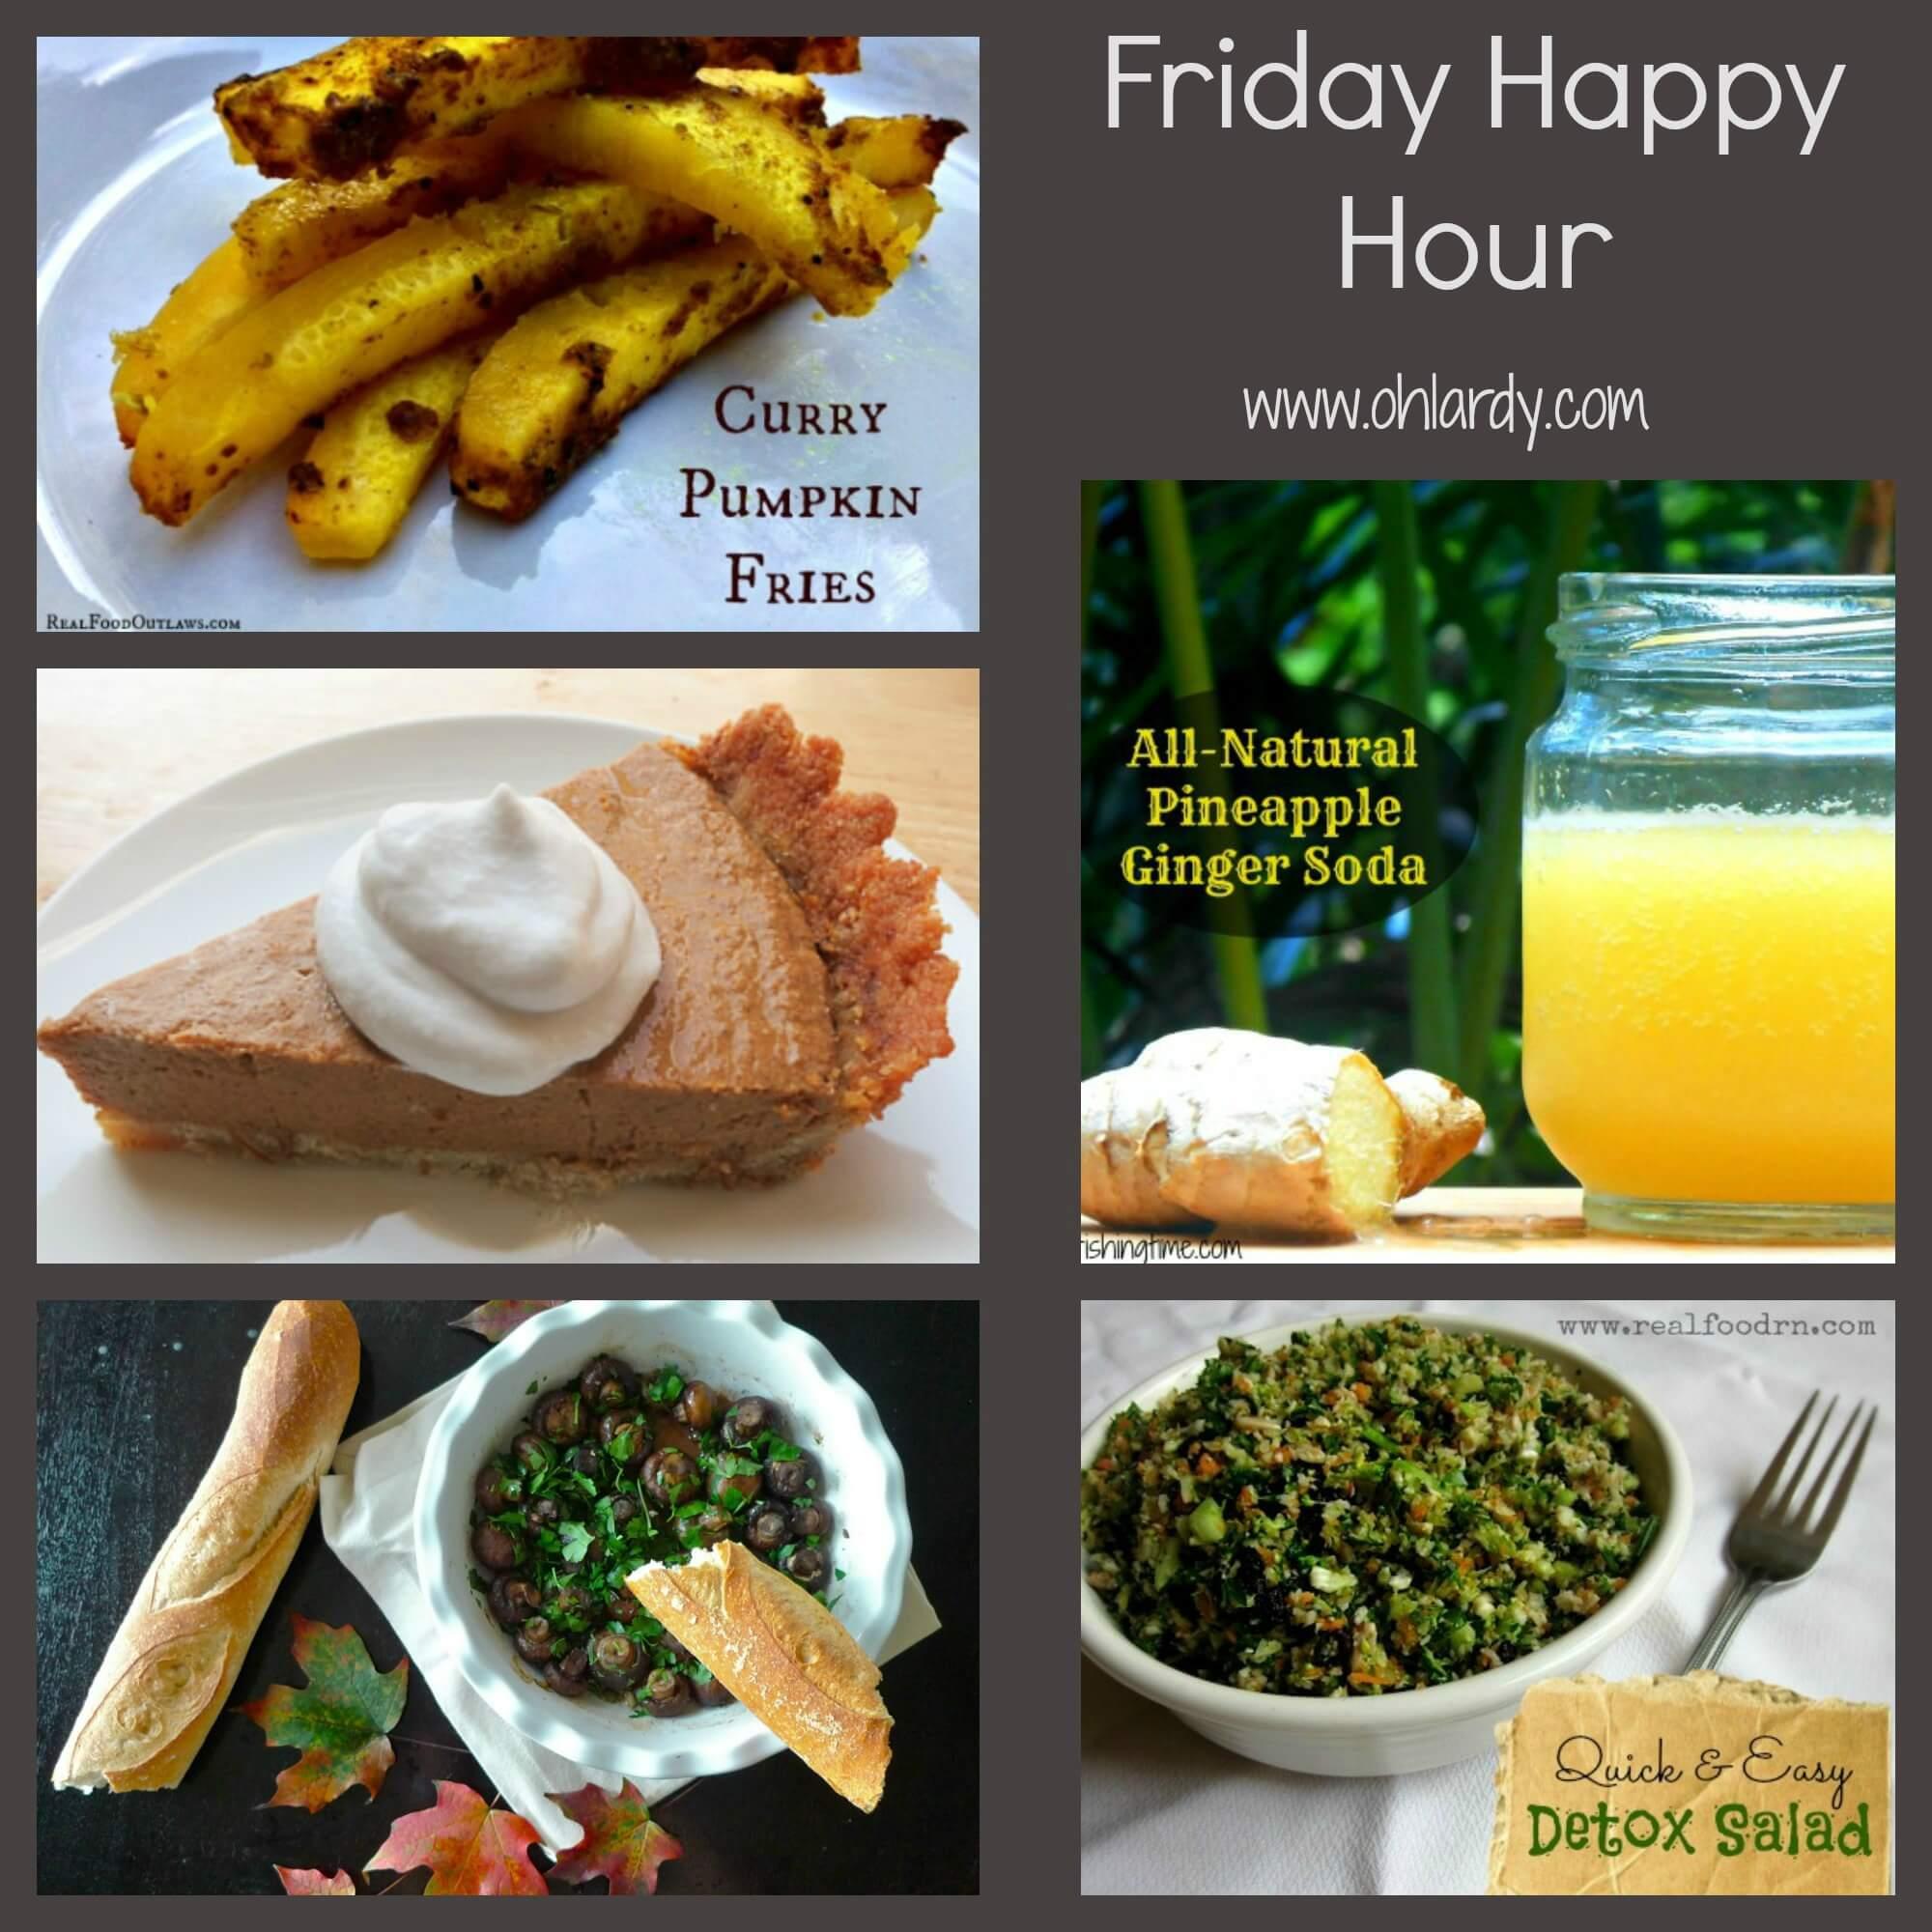 Friday Happy Hour!